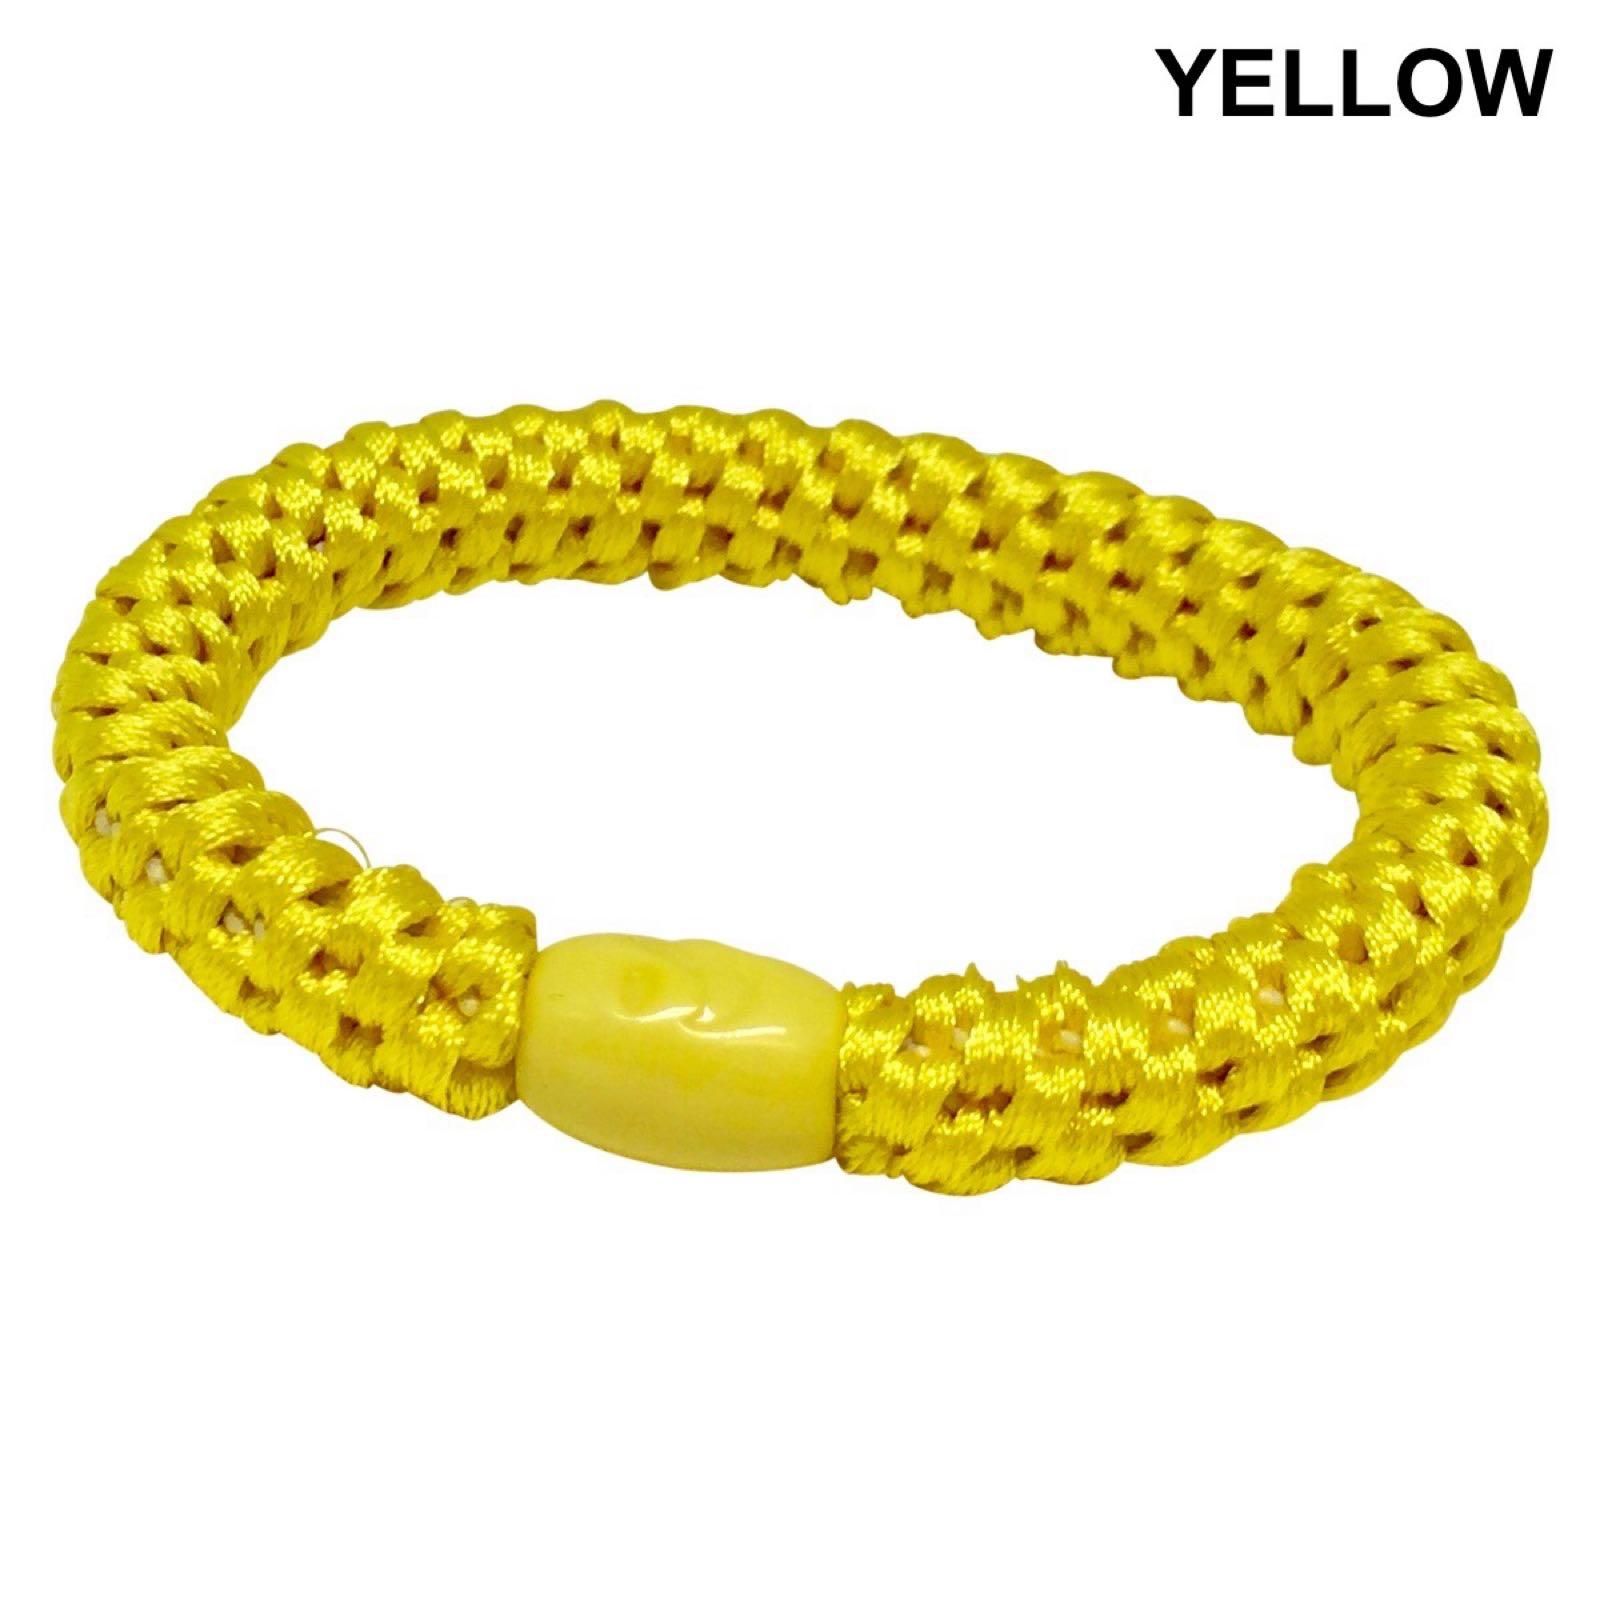 Annica Vallin, Supersnodd, Yellow